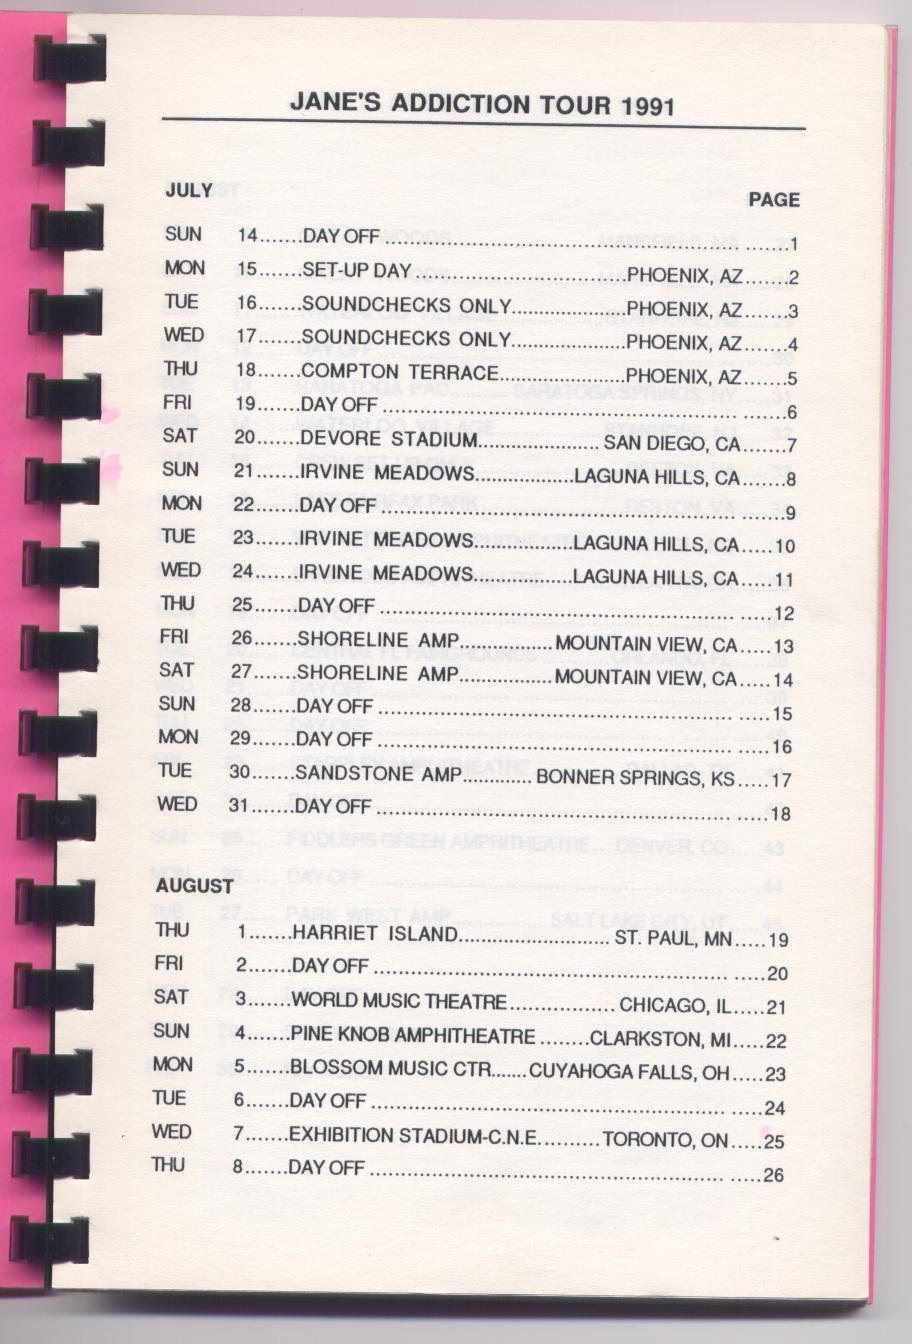 Janesaddiction Org Tour Info Jane S Addiction August 04 1991 Pine Knob Music Theatre